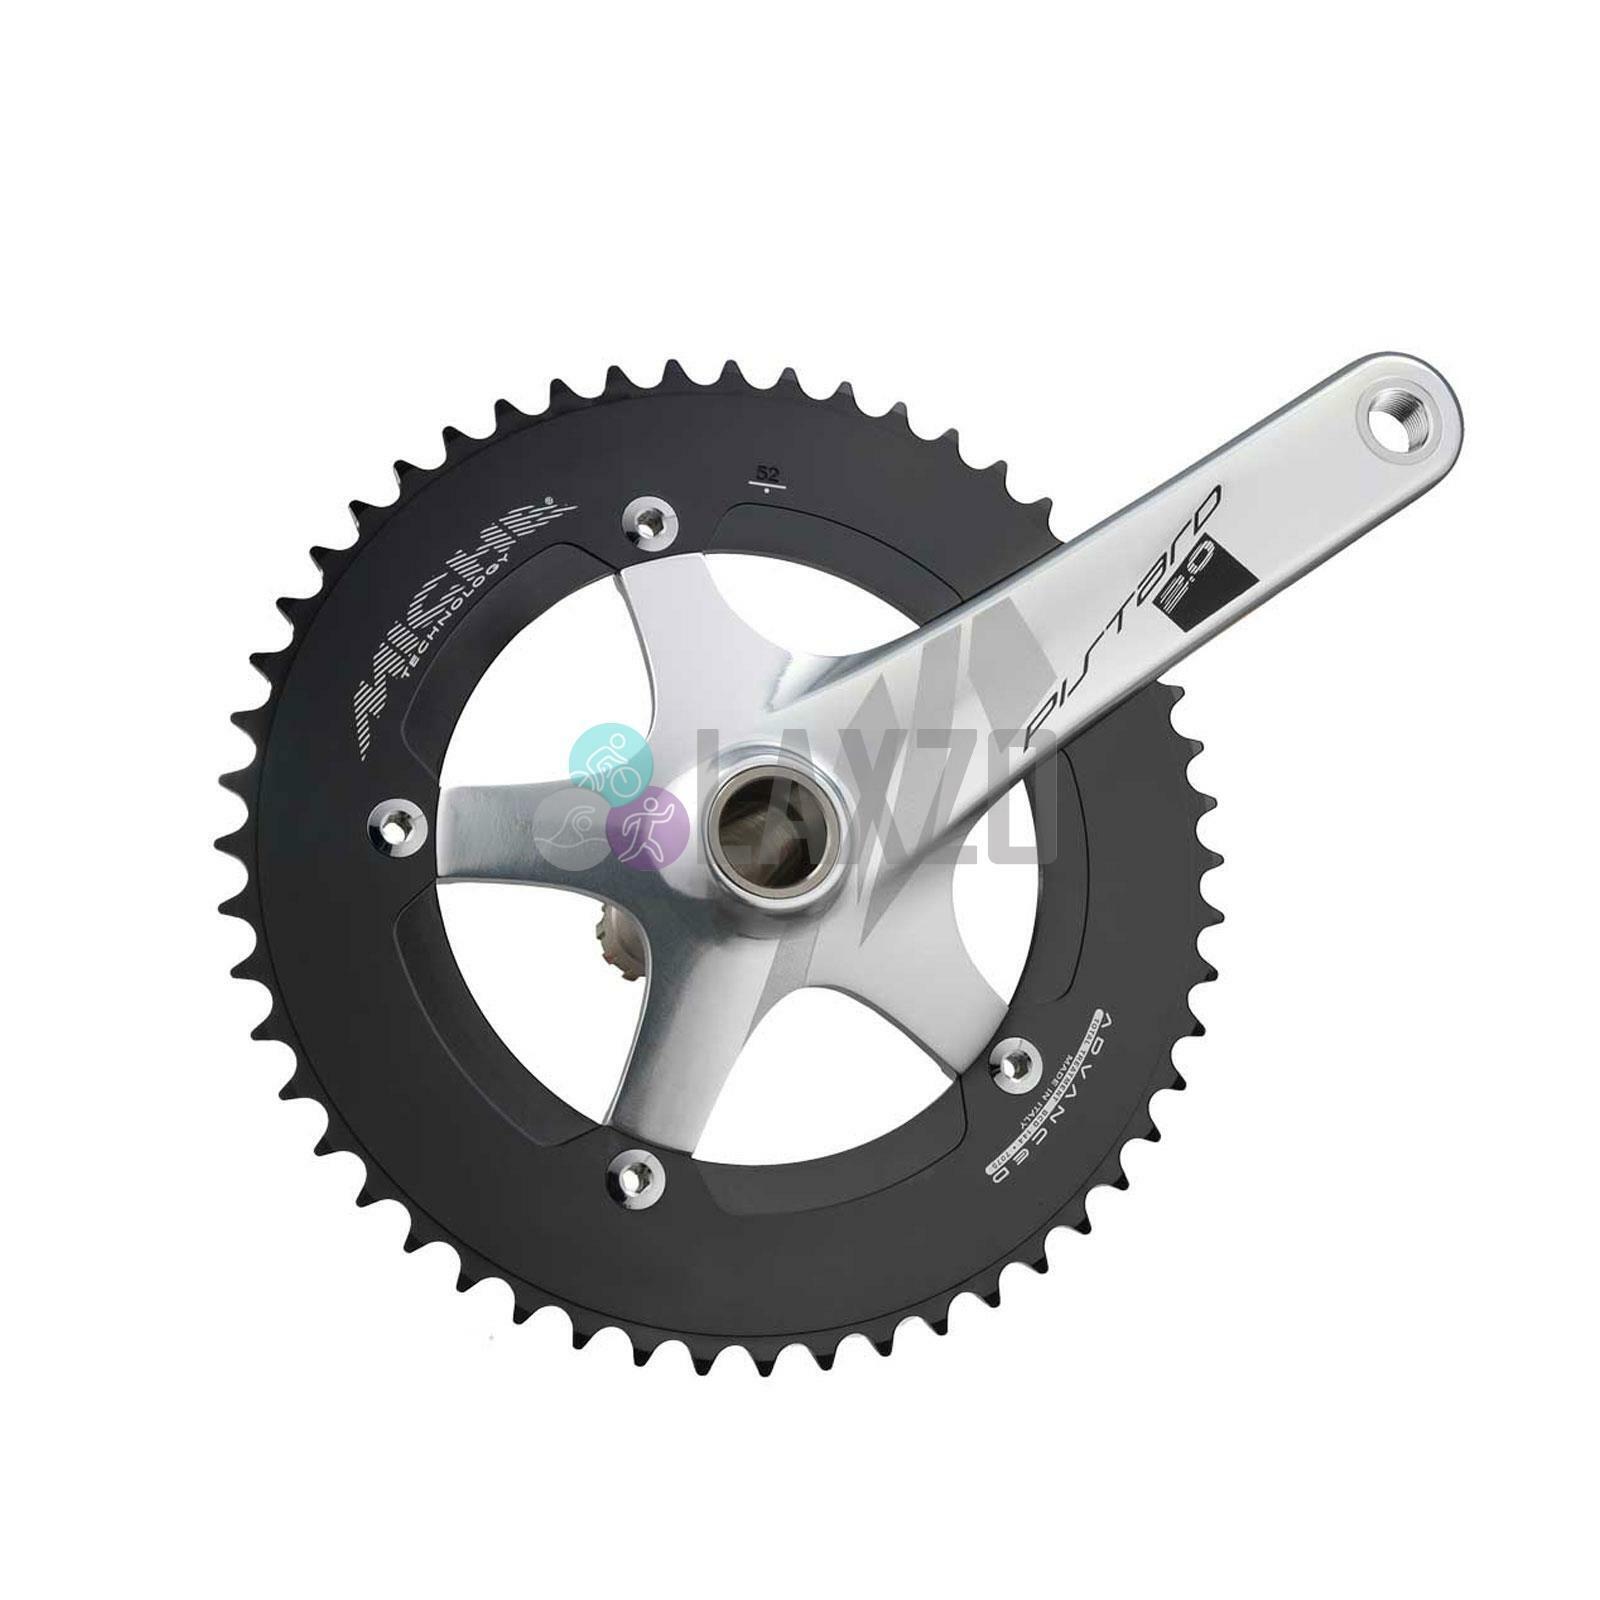 Miche Piestrellad 2.0 Set Catena 49T Aria 170 Bicicletta argentoo 1 Pezzi